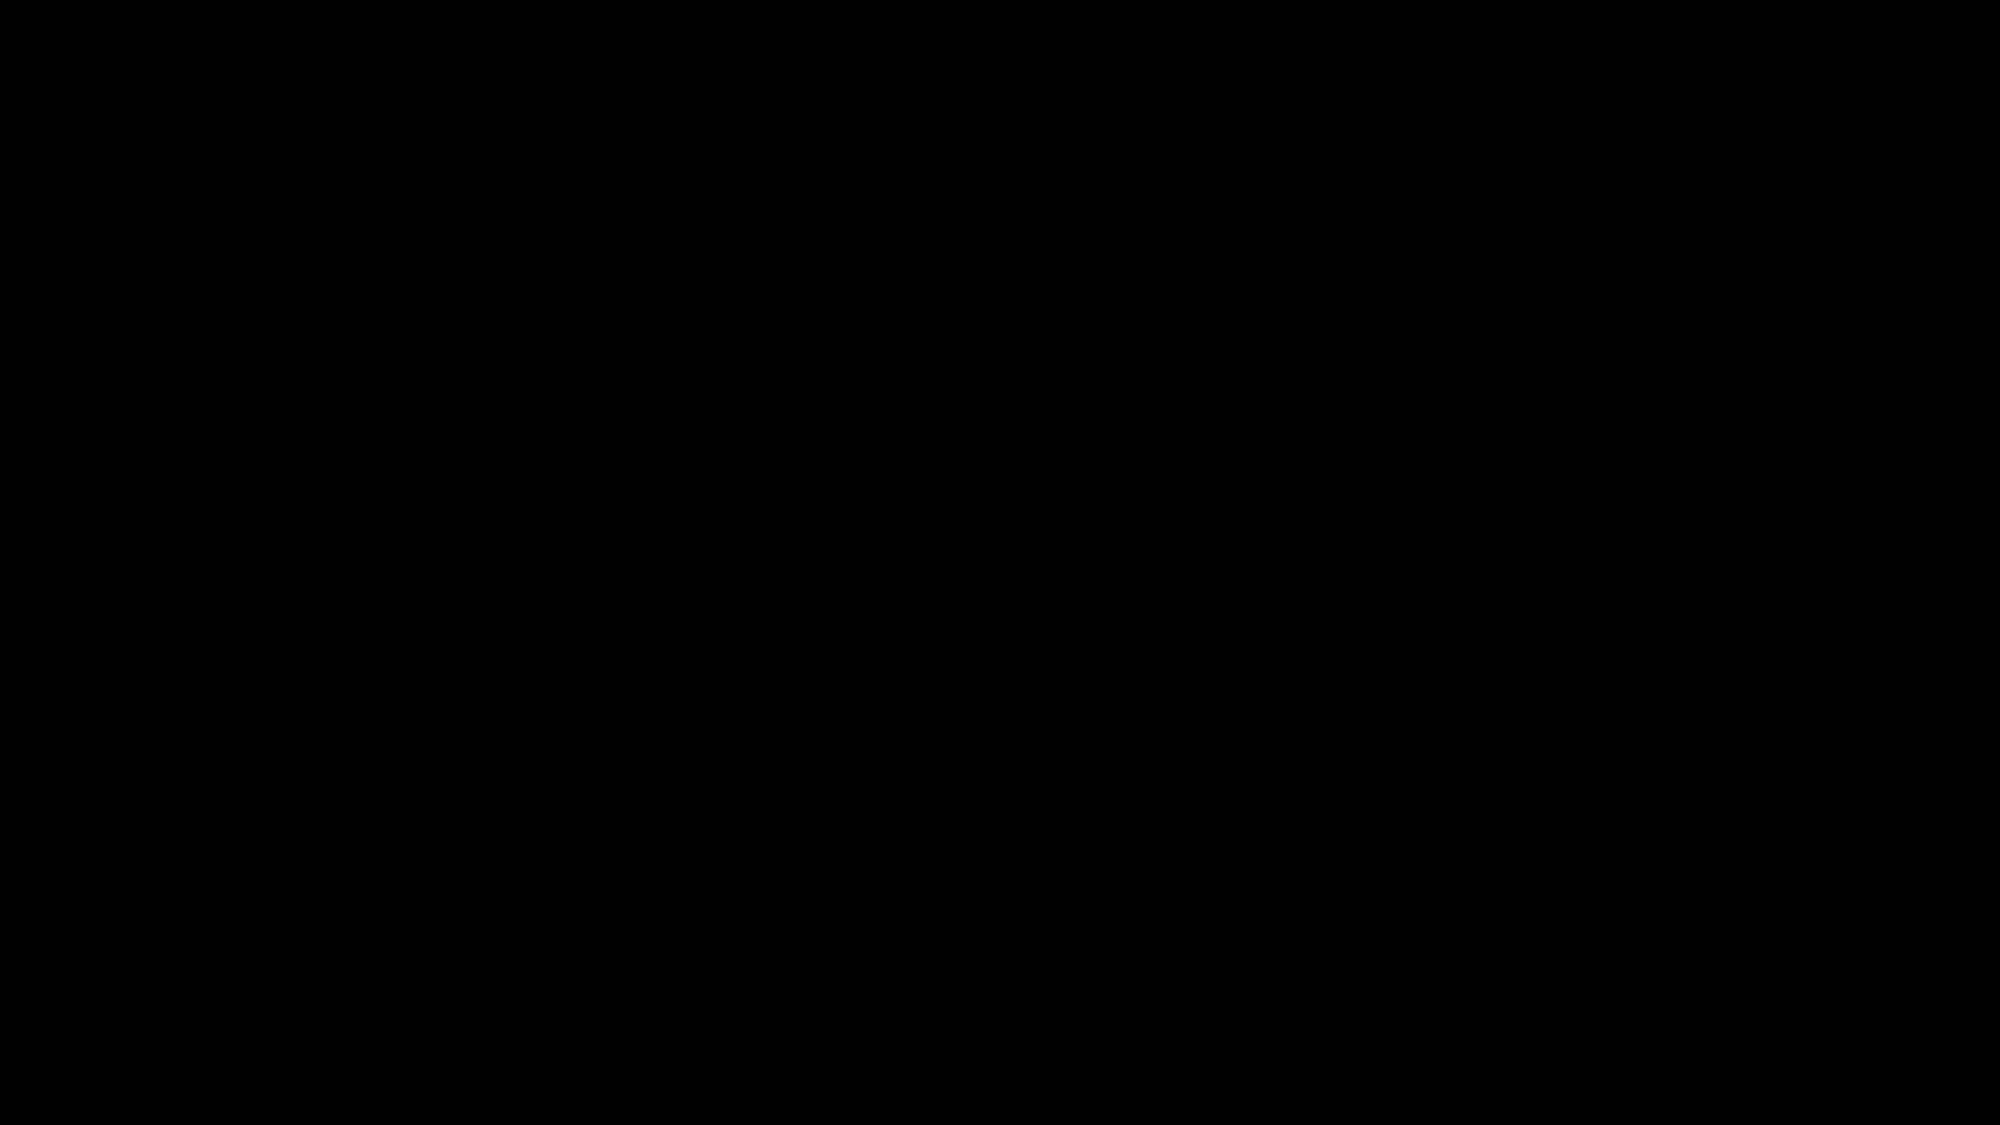 Black Background 60 Percent.png